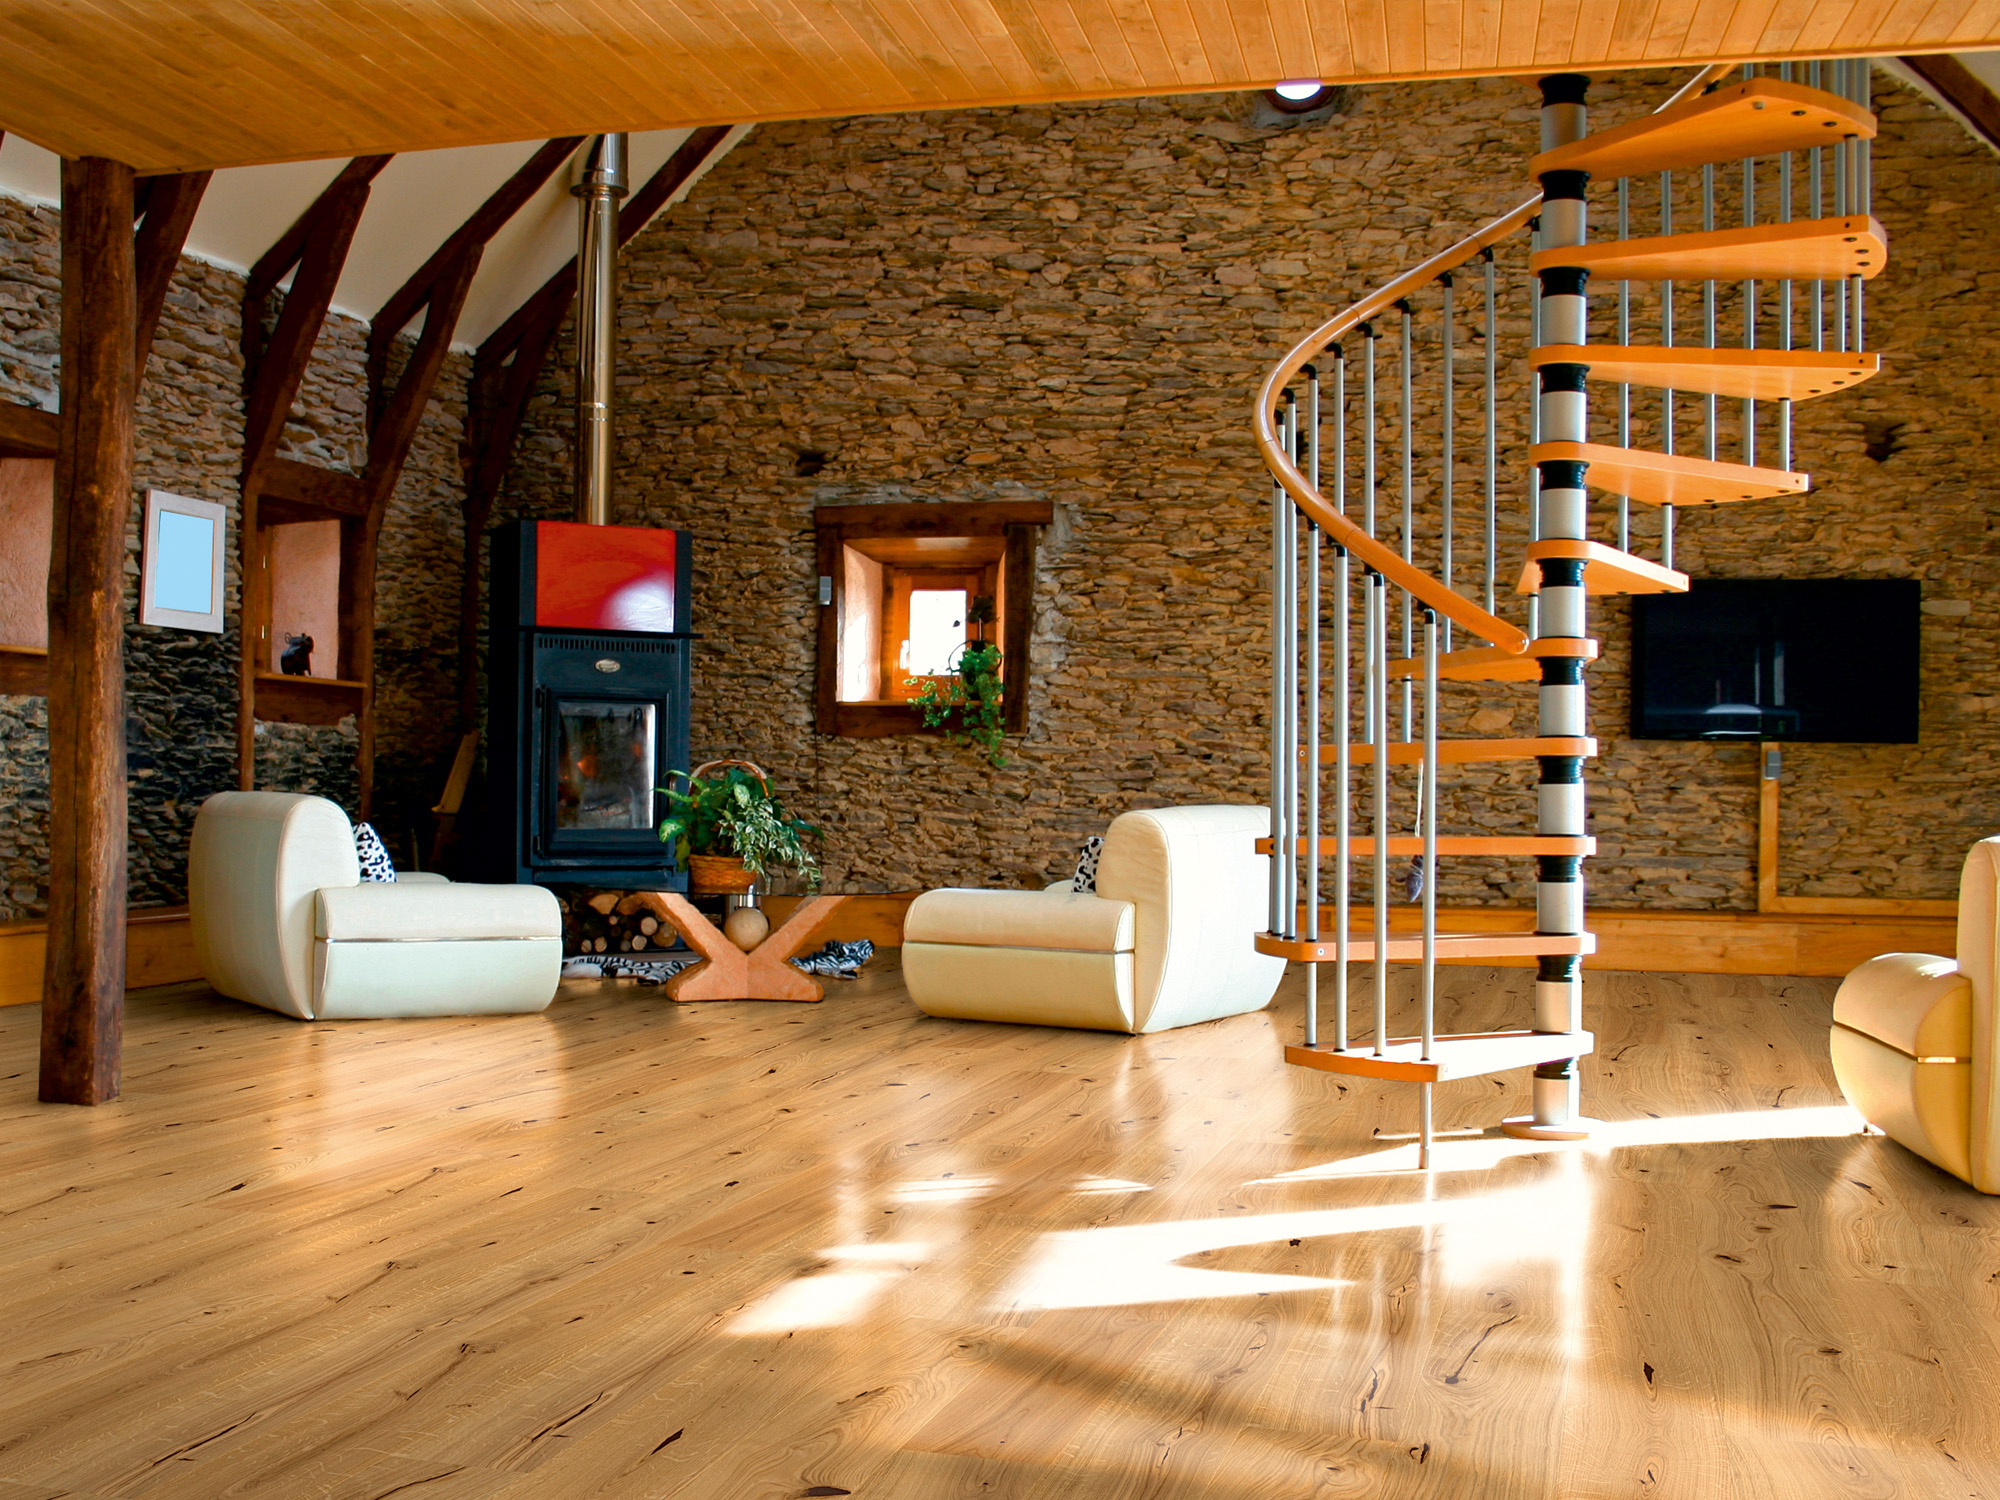 Cost of floor tile installation